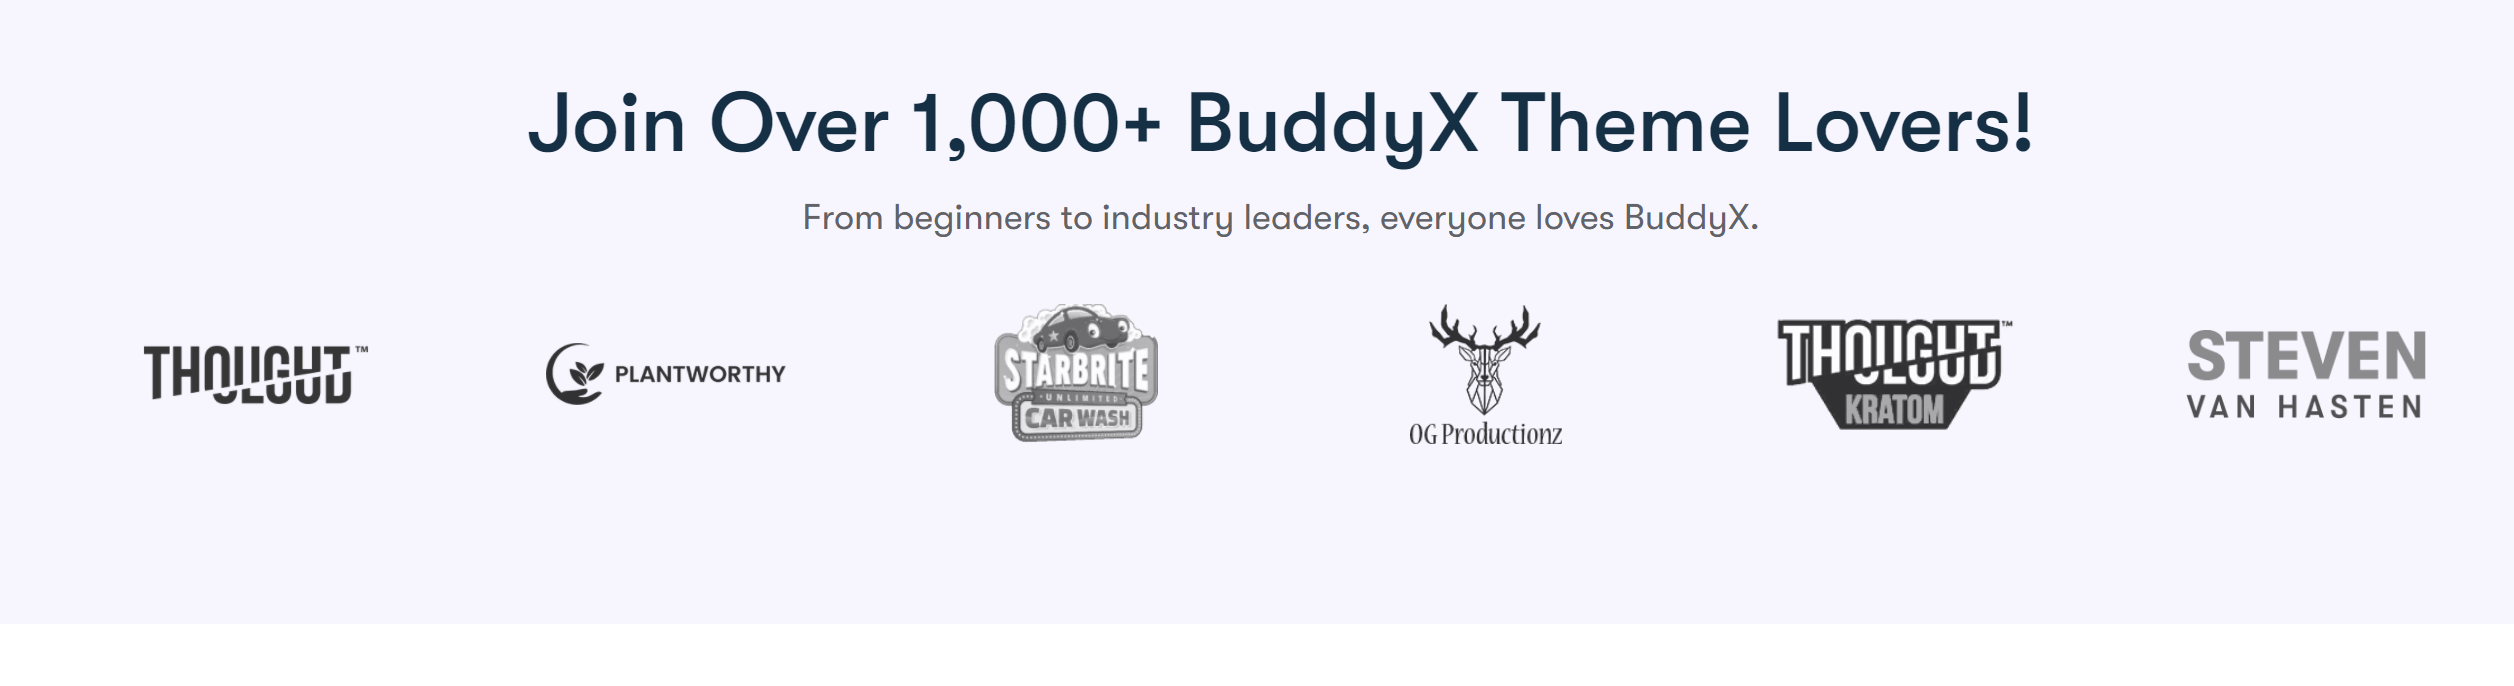 Buddyx Pro Theme